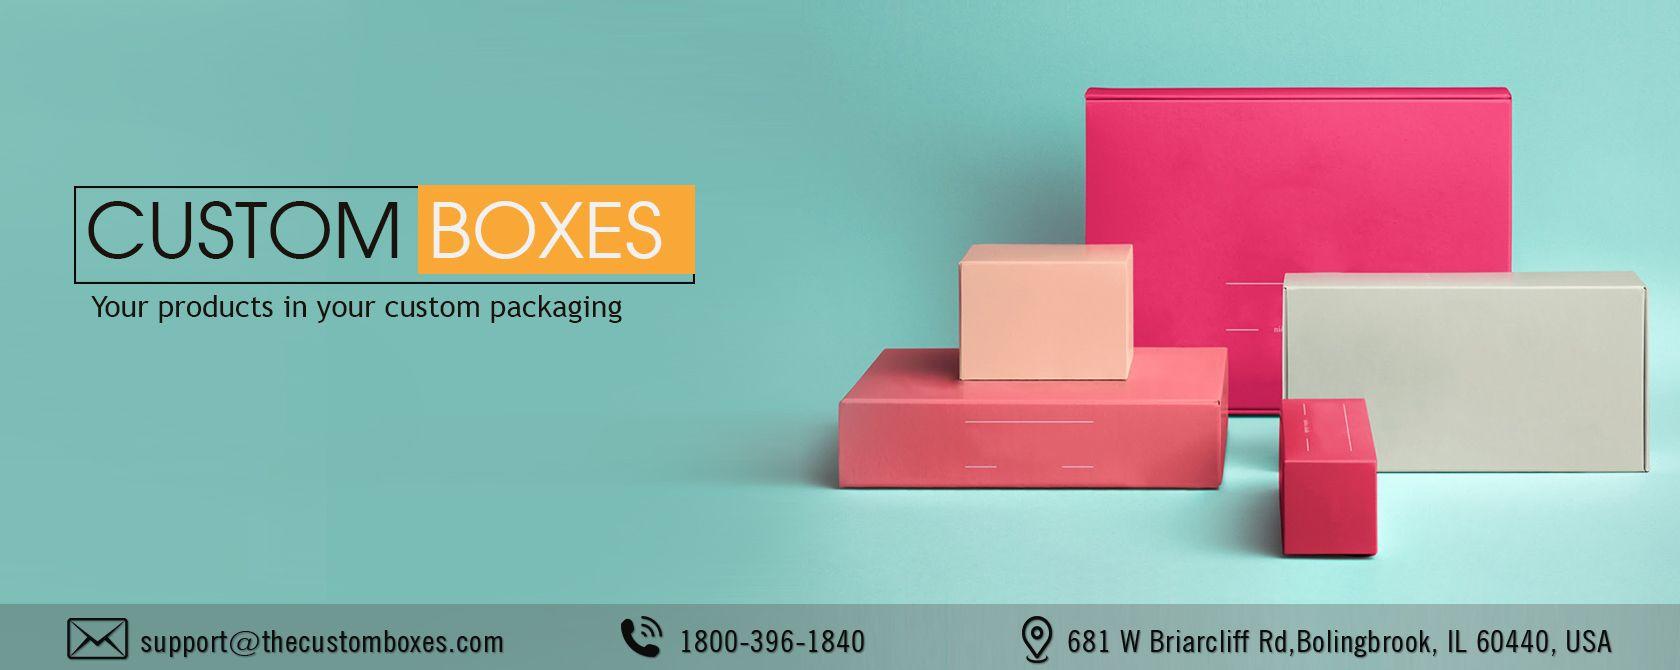 custom-boxes.jpg